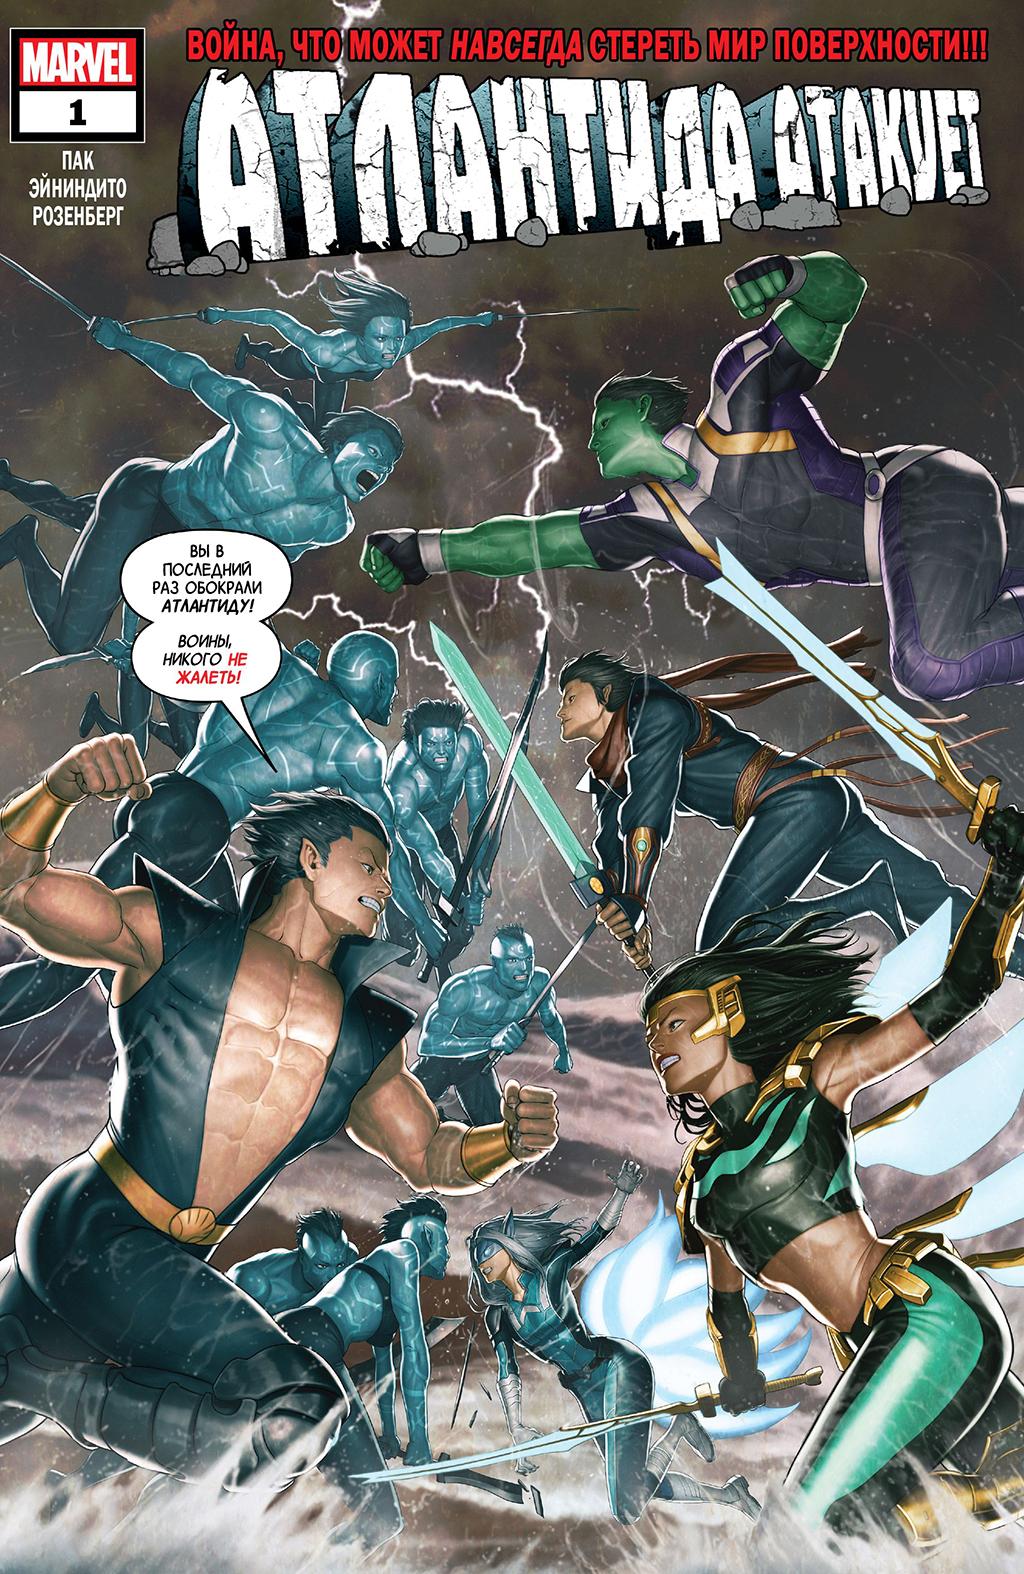 Комикс Атлантида атакует